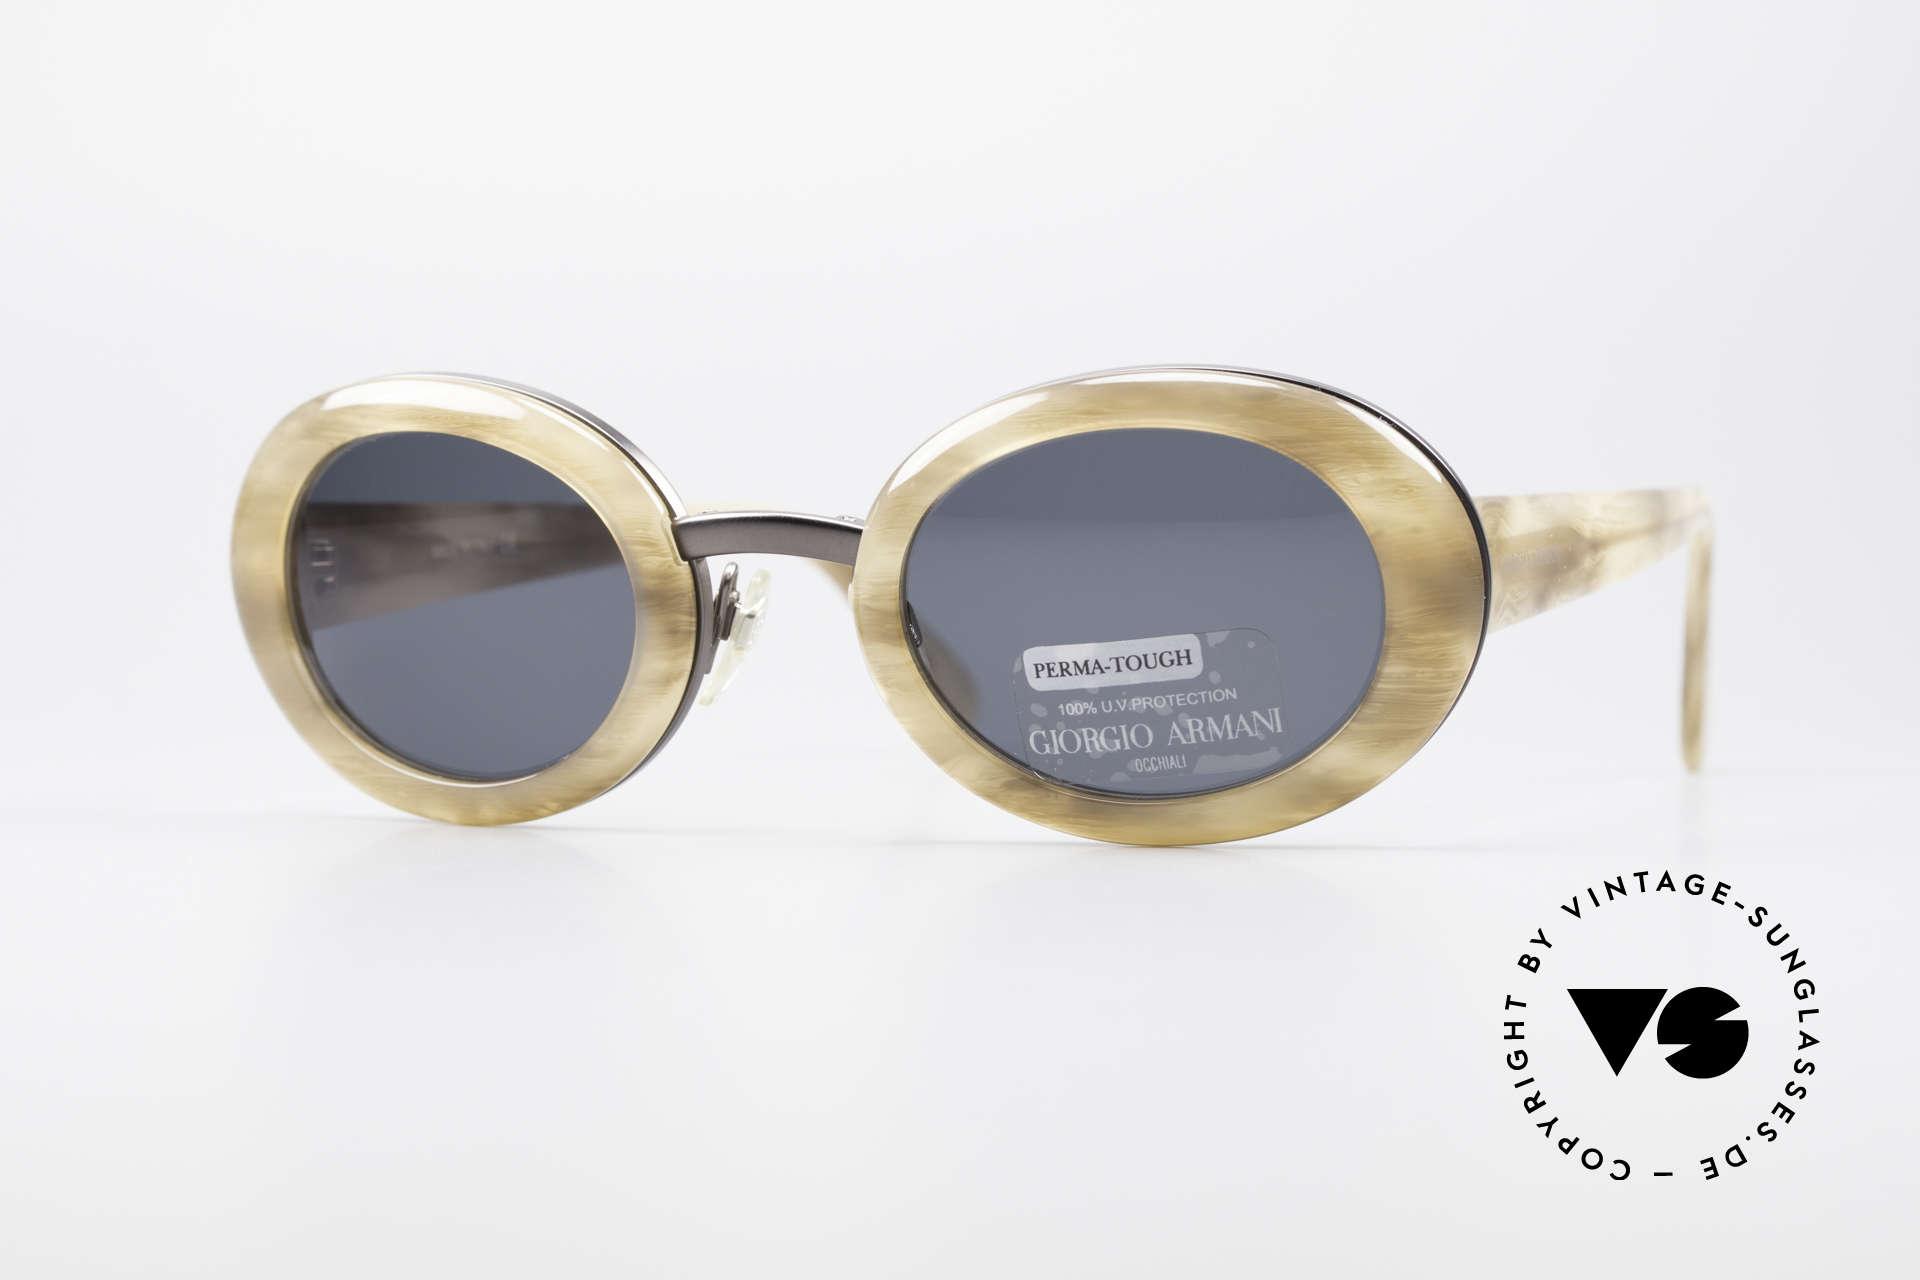 Giorgio Armani 945 90's Designer Shades Ladies, extraordinary designer sunglasses by GIORGIO Armani, Made for Women